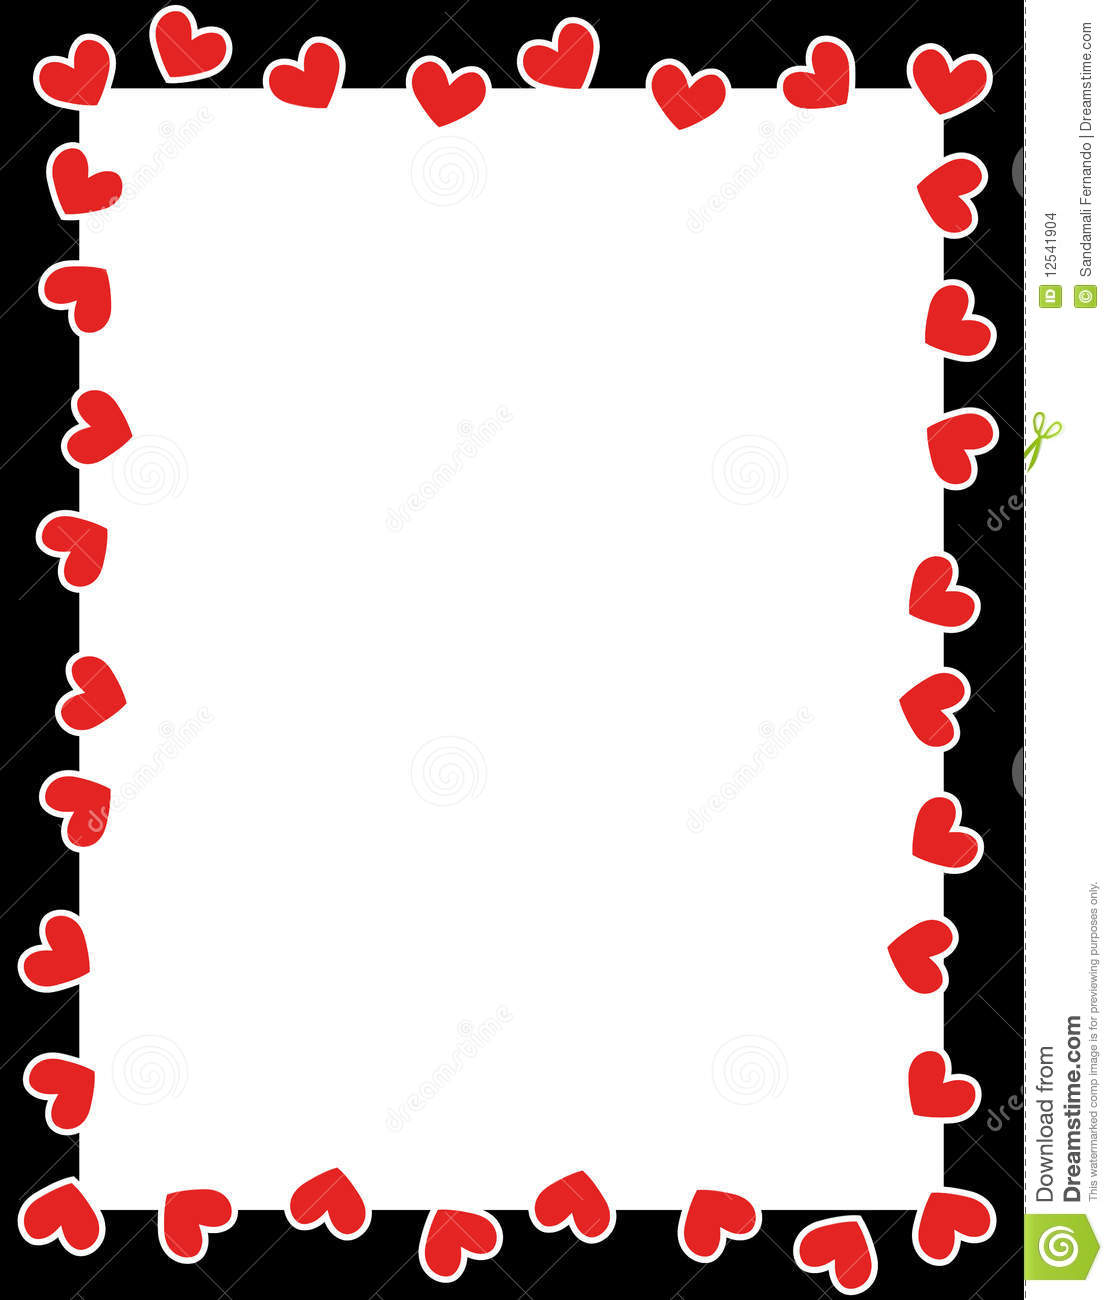 Clip art, Valentines day .